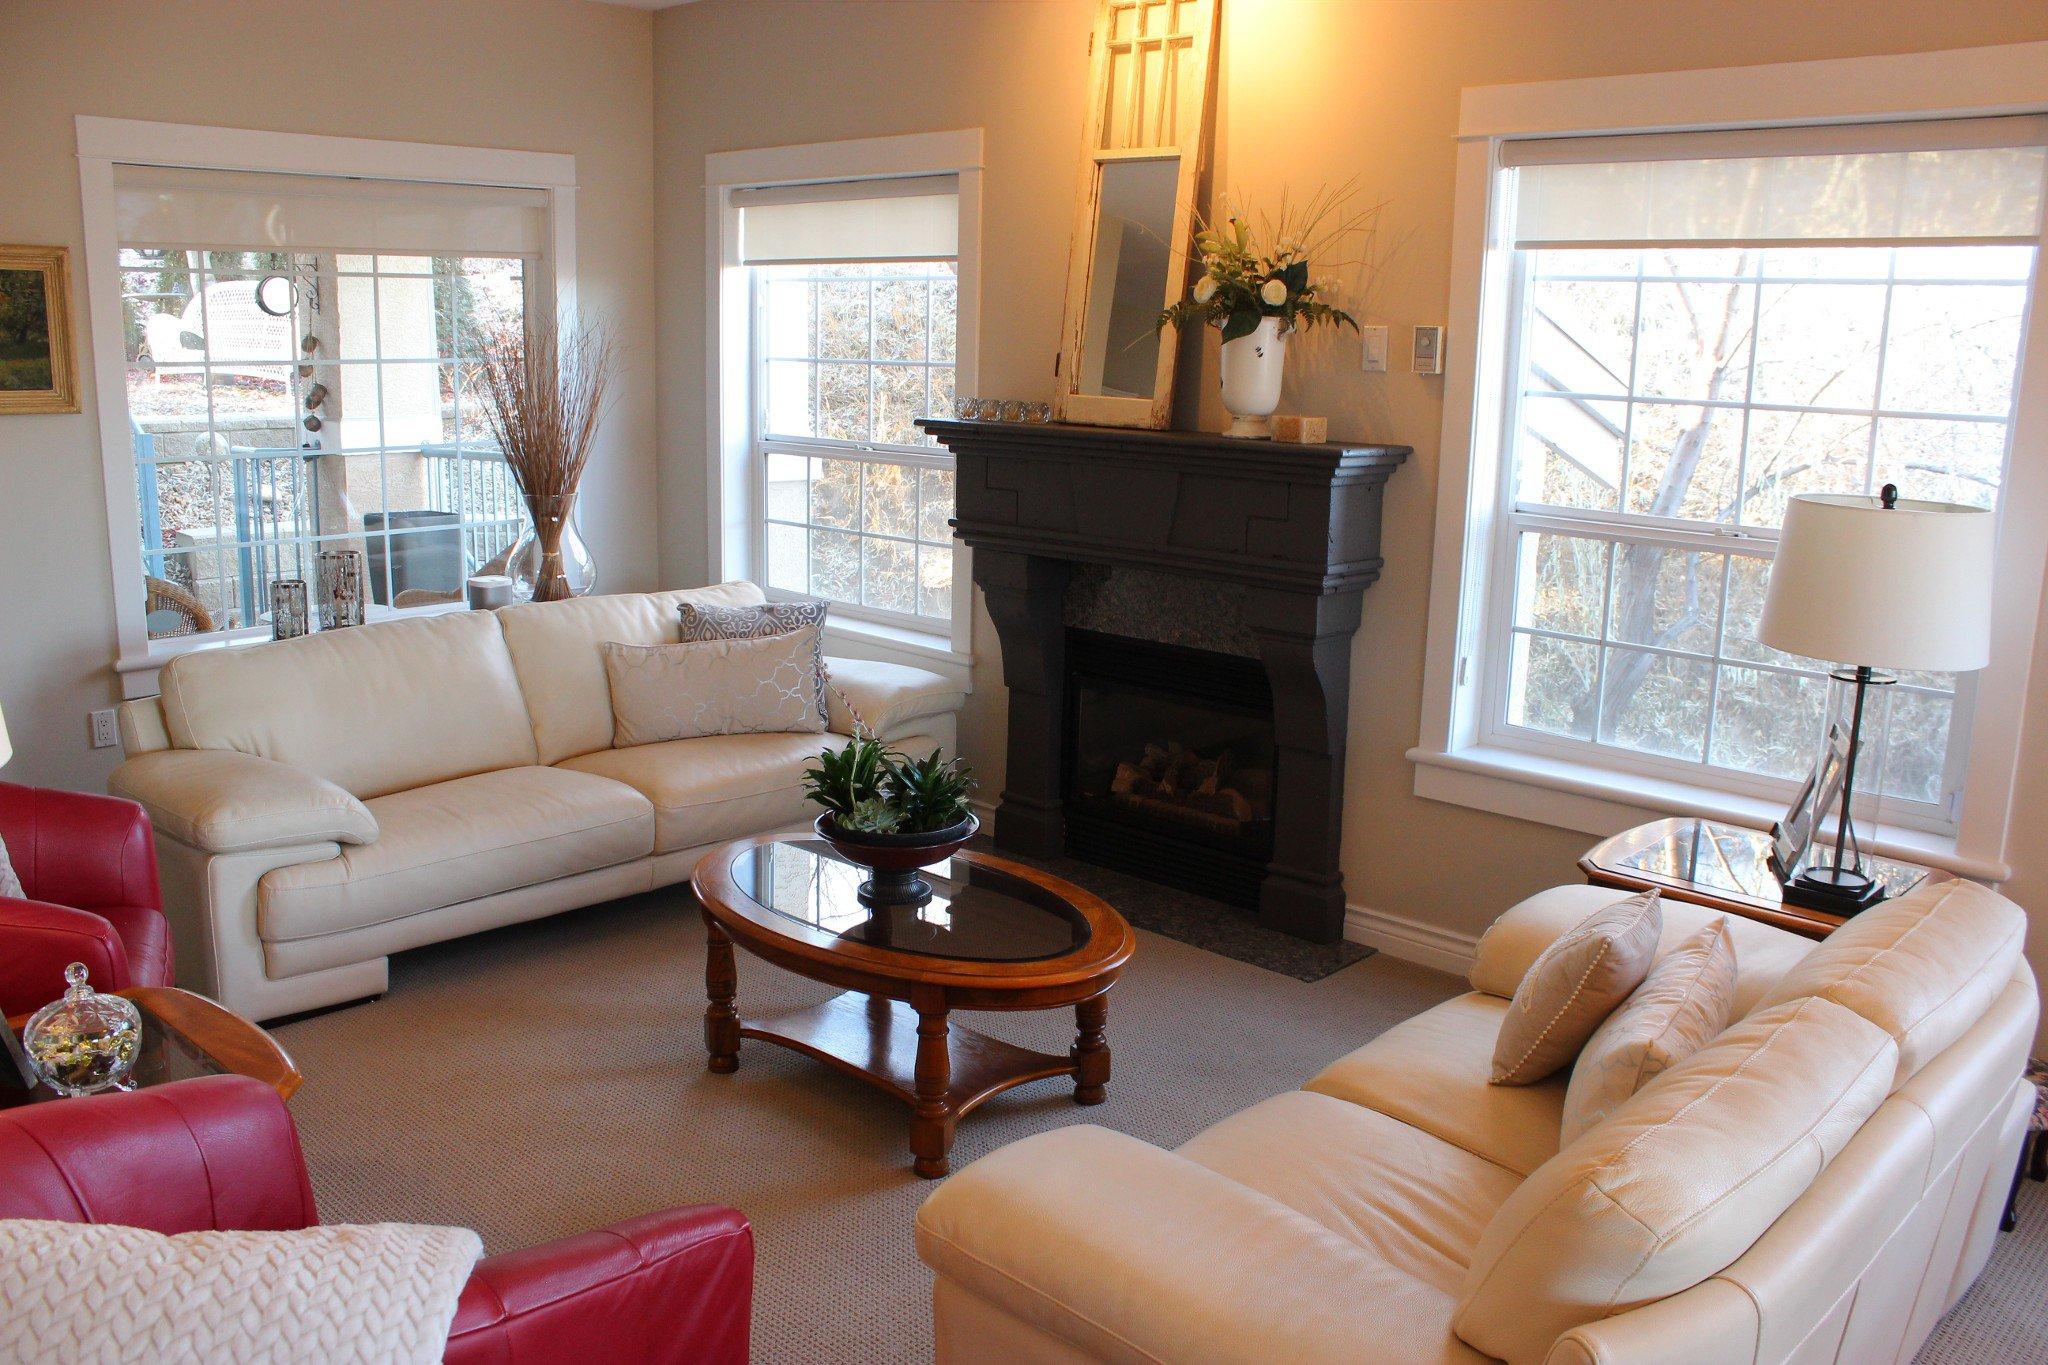 Photo 3: Photos: 101 875 Sahali Terrace in Kamloops: Lower Sahali Townhouse for sale : MLS®# 154556